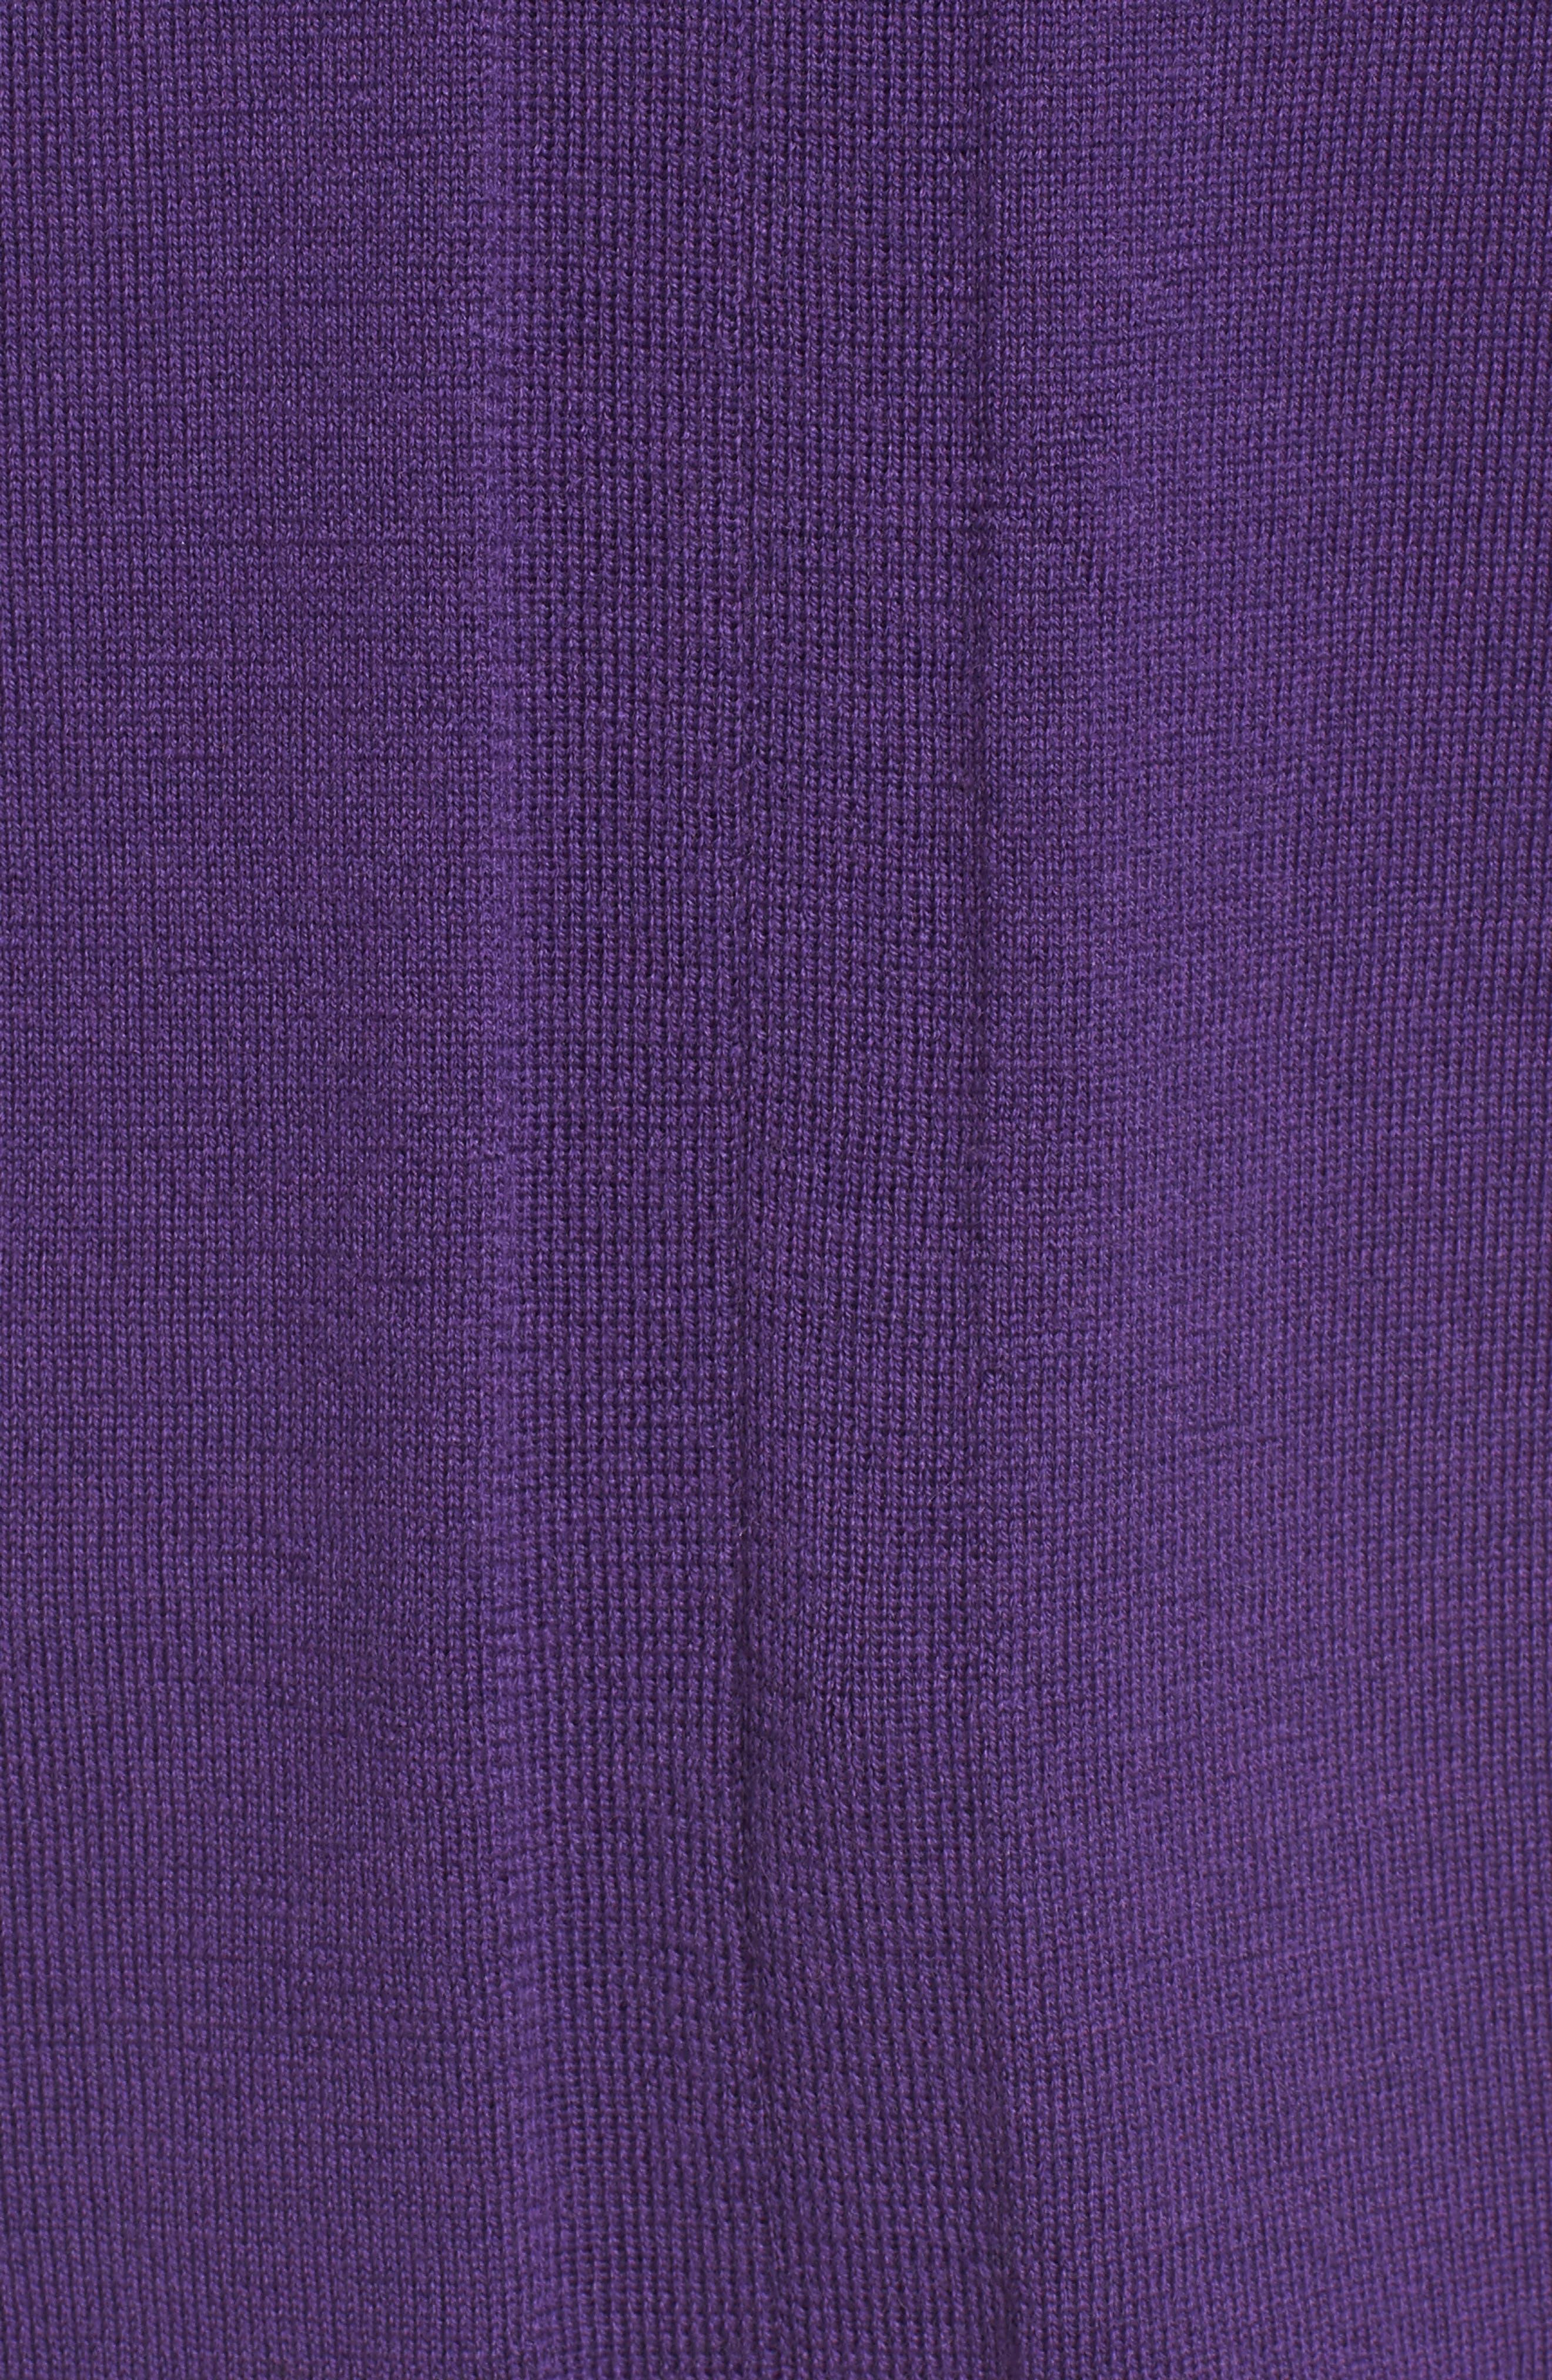 Merino Wool Tunic Sweater,                             Alternate thumbnail 5, color,                             Purple Rain